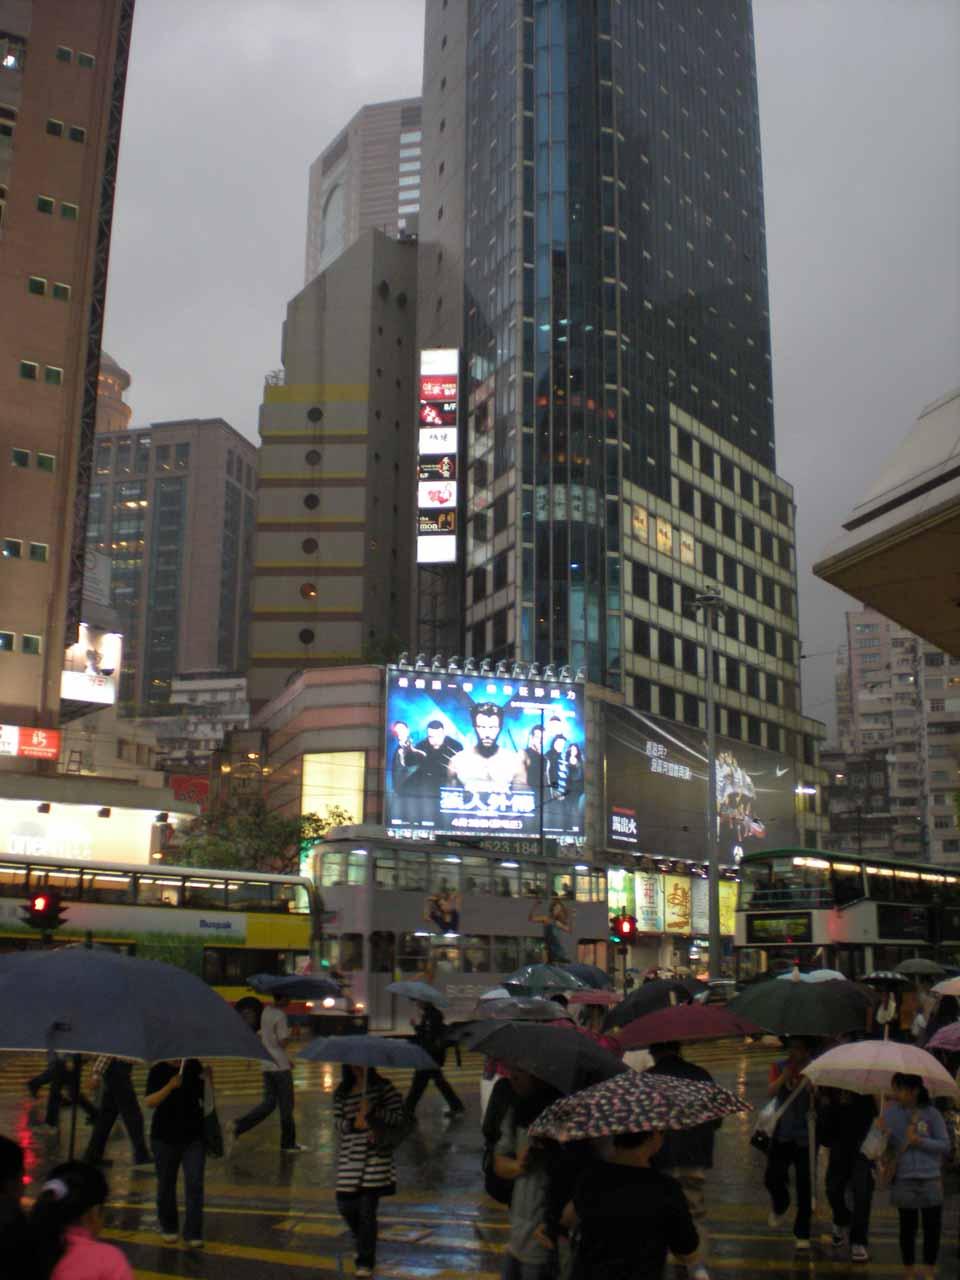 The Sogo area of Hong Kong